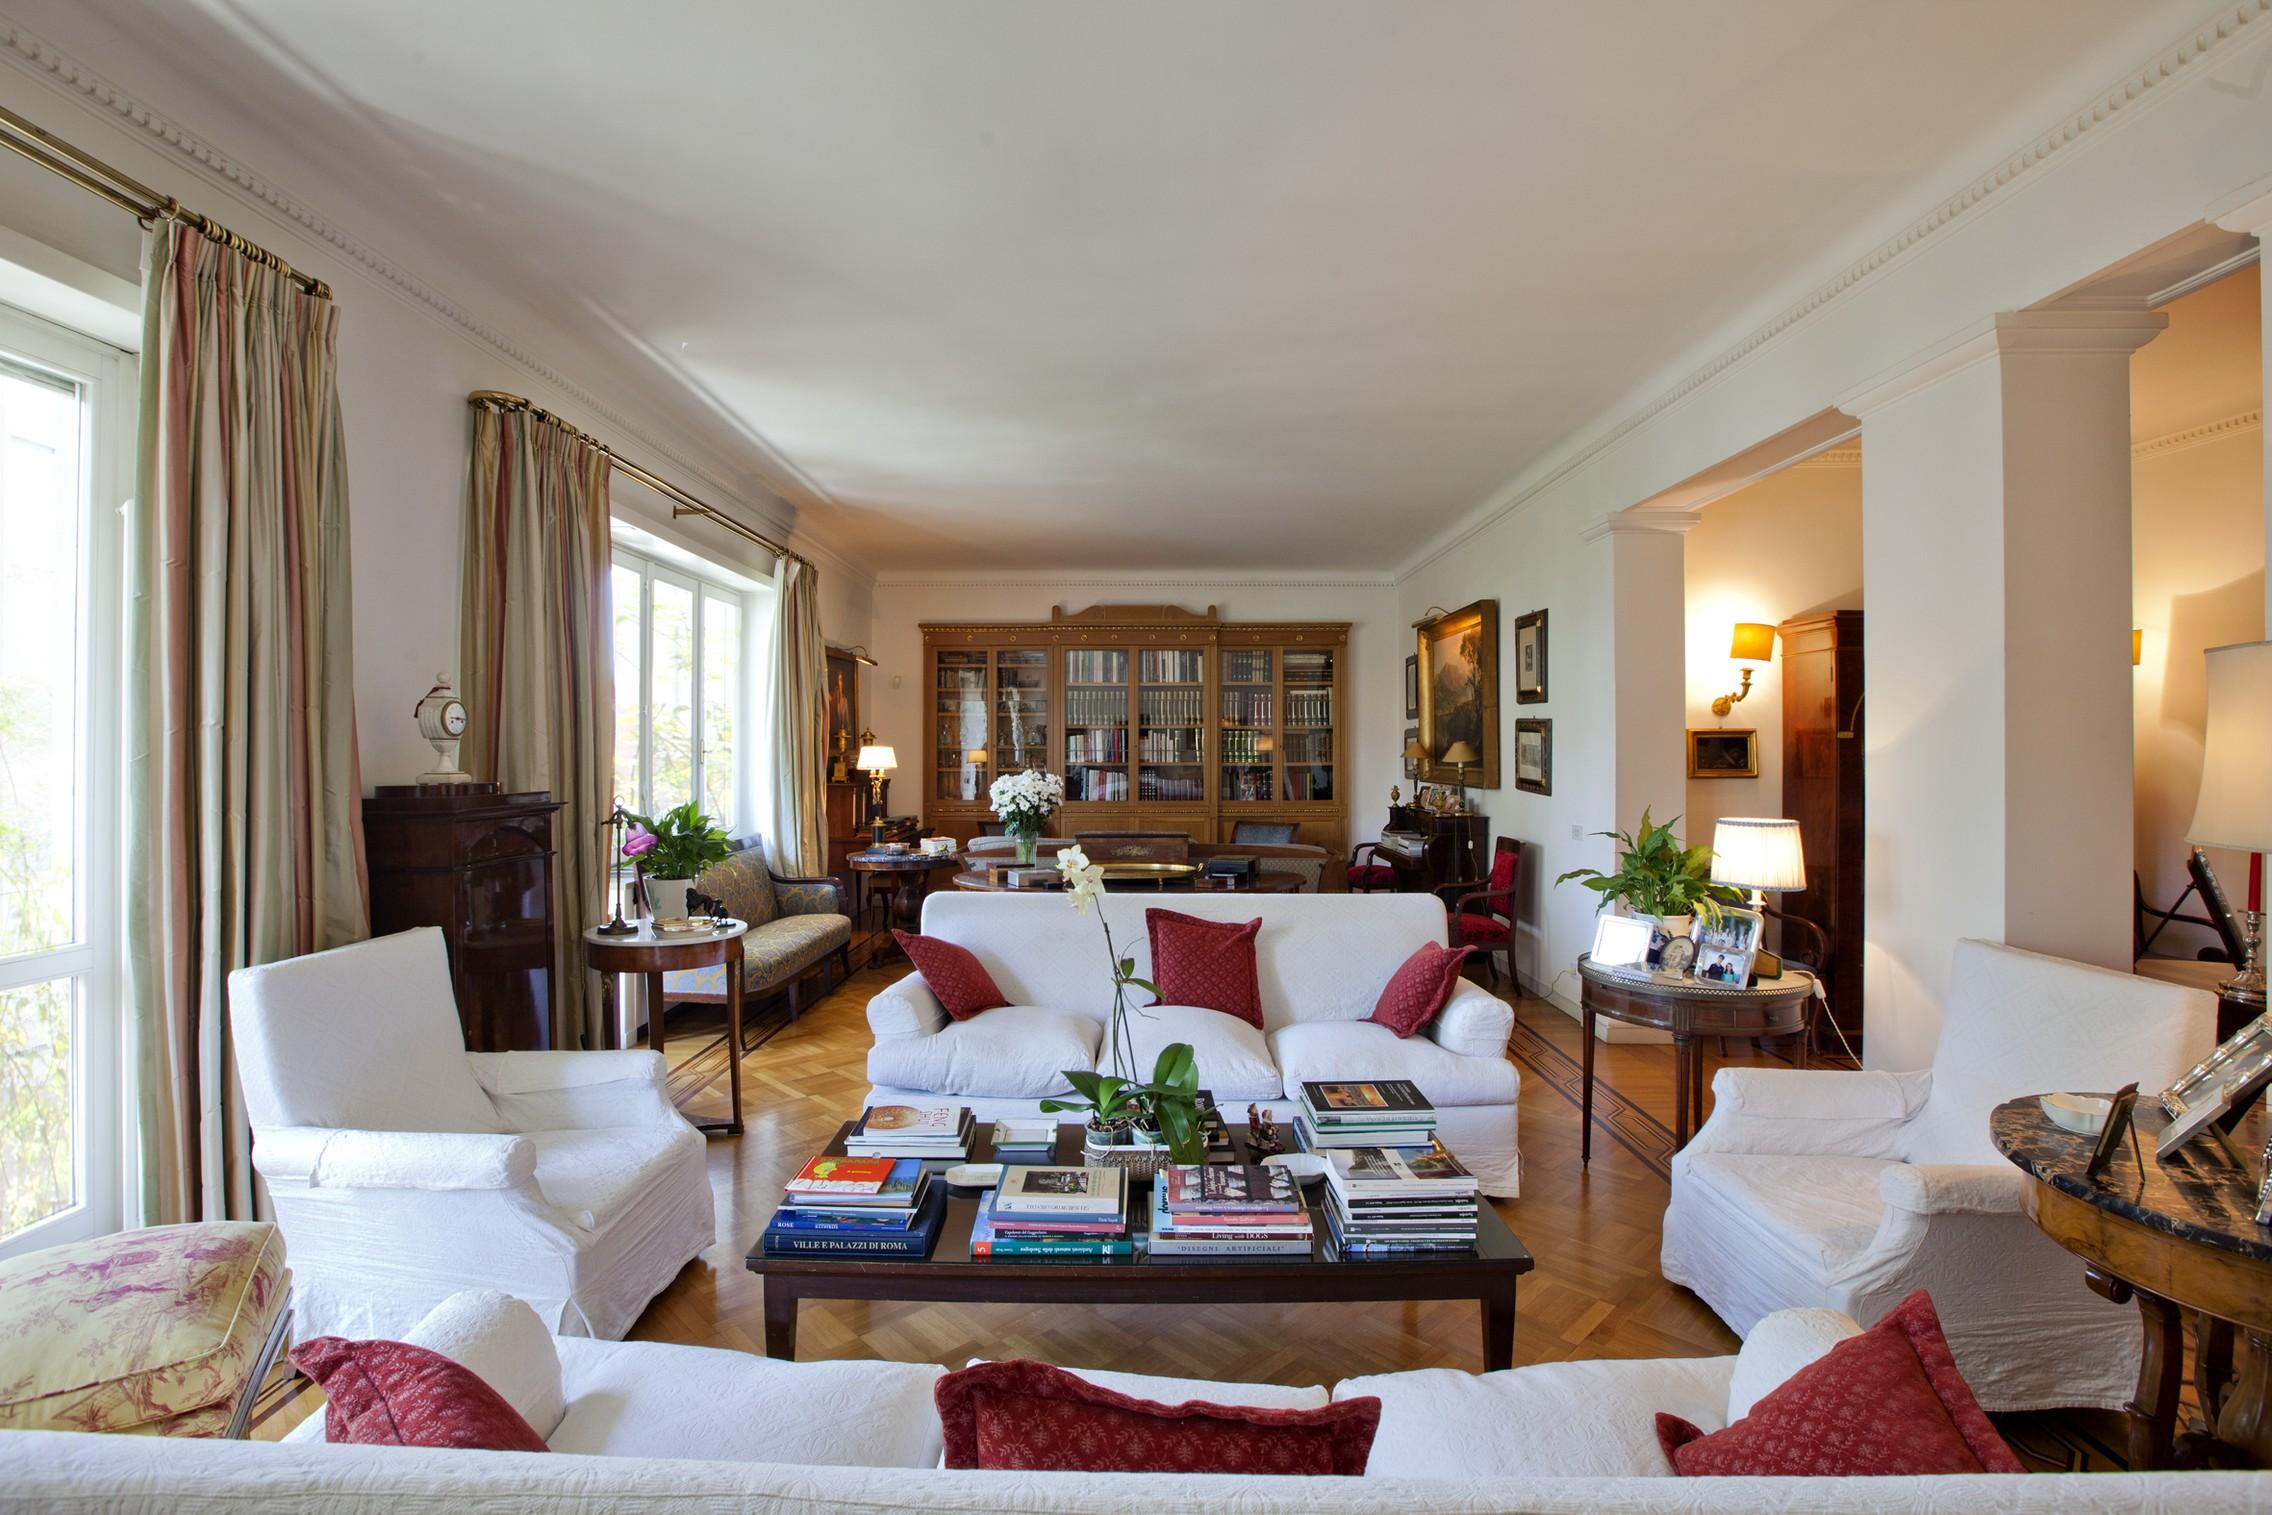 Apartment for Sale at Splendid Rome Apartment Pietro Antonio Micheli Rome, Rome 00197 Italy